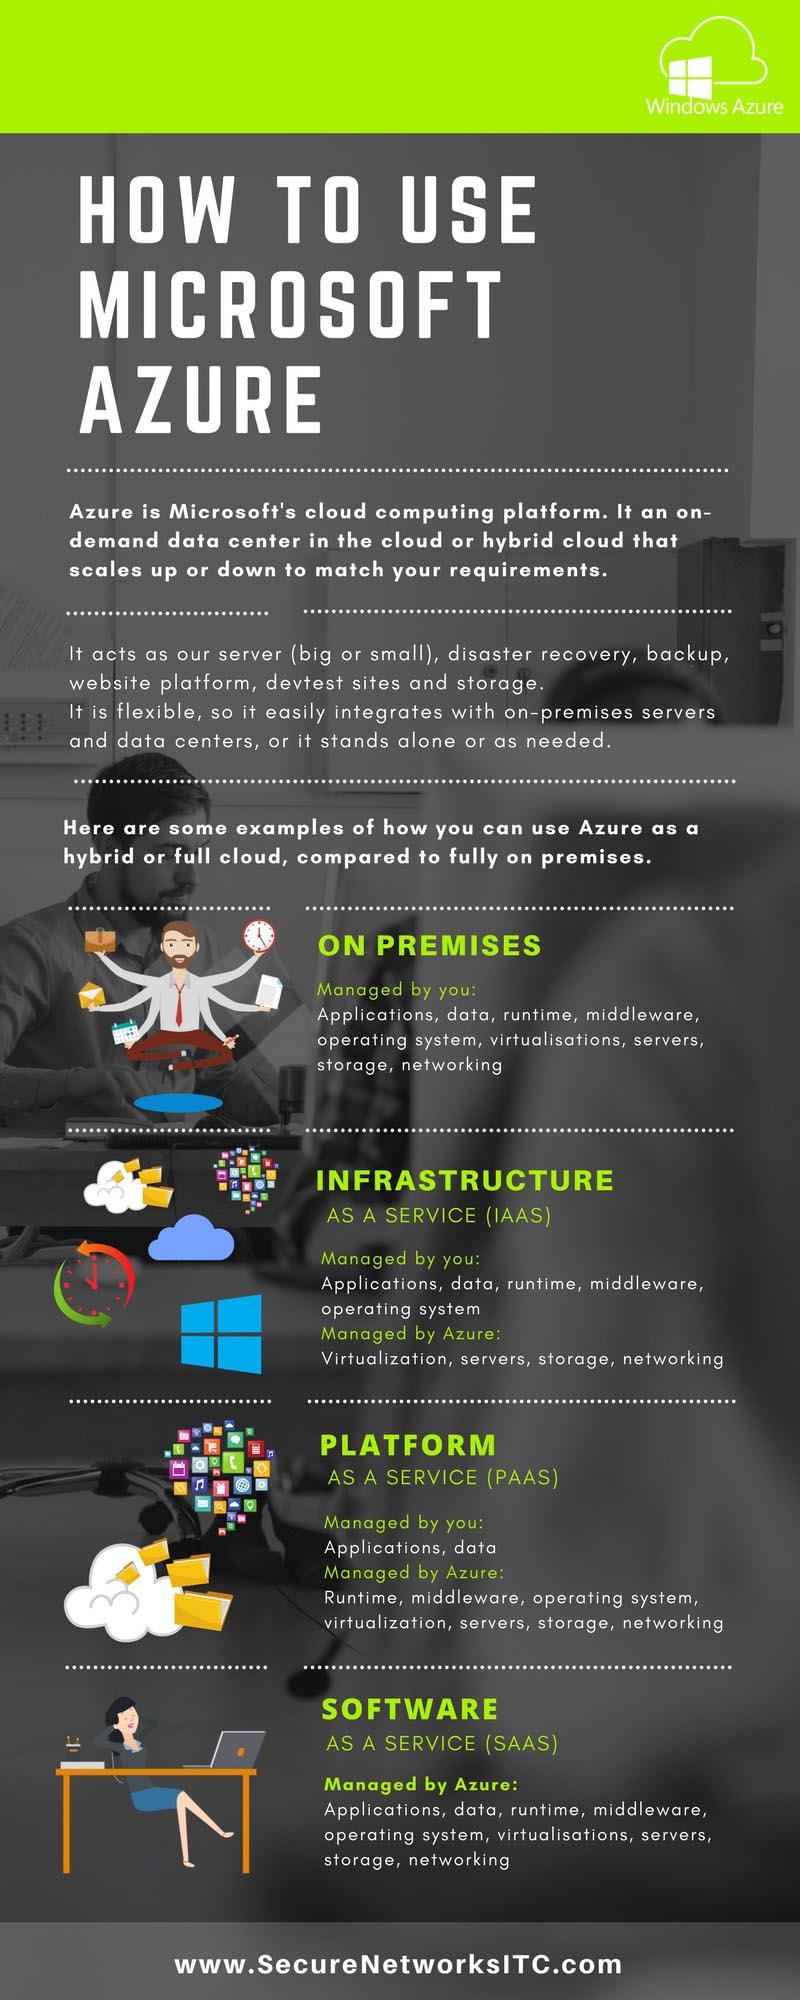 San Diego Microsoft Azure - Infographic